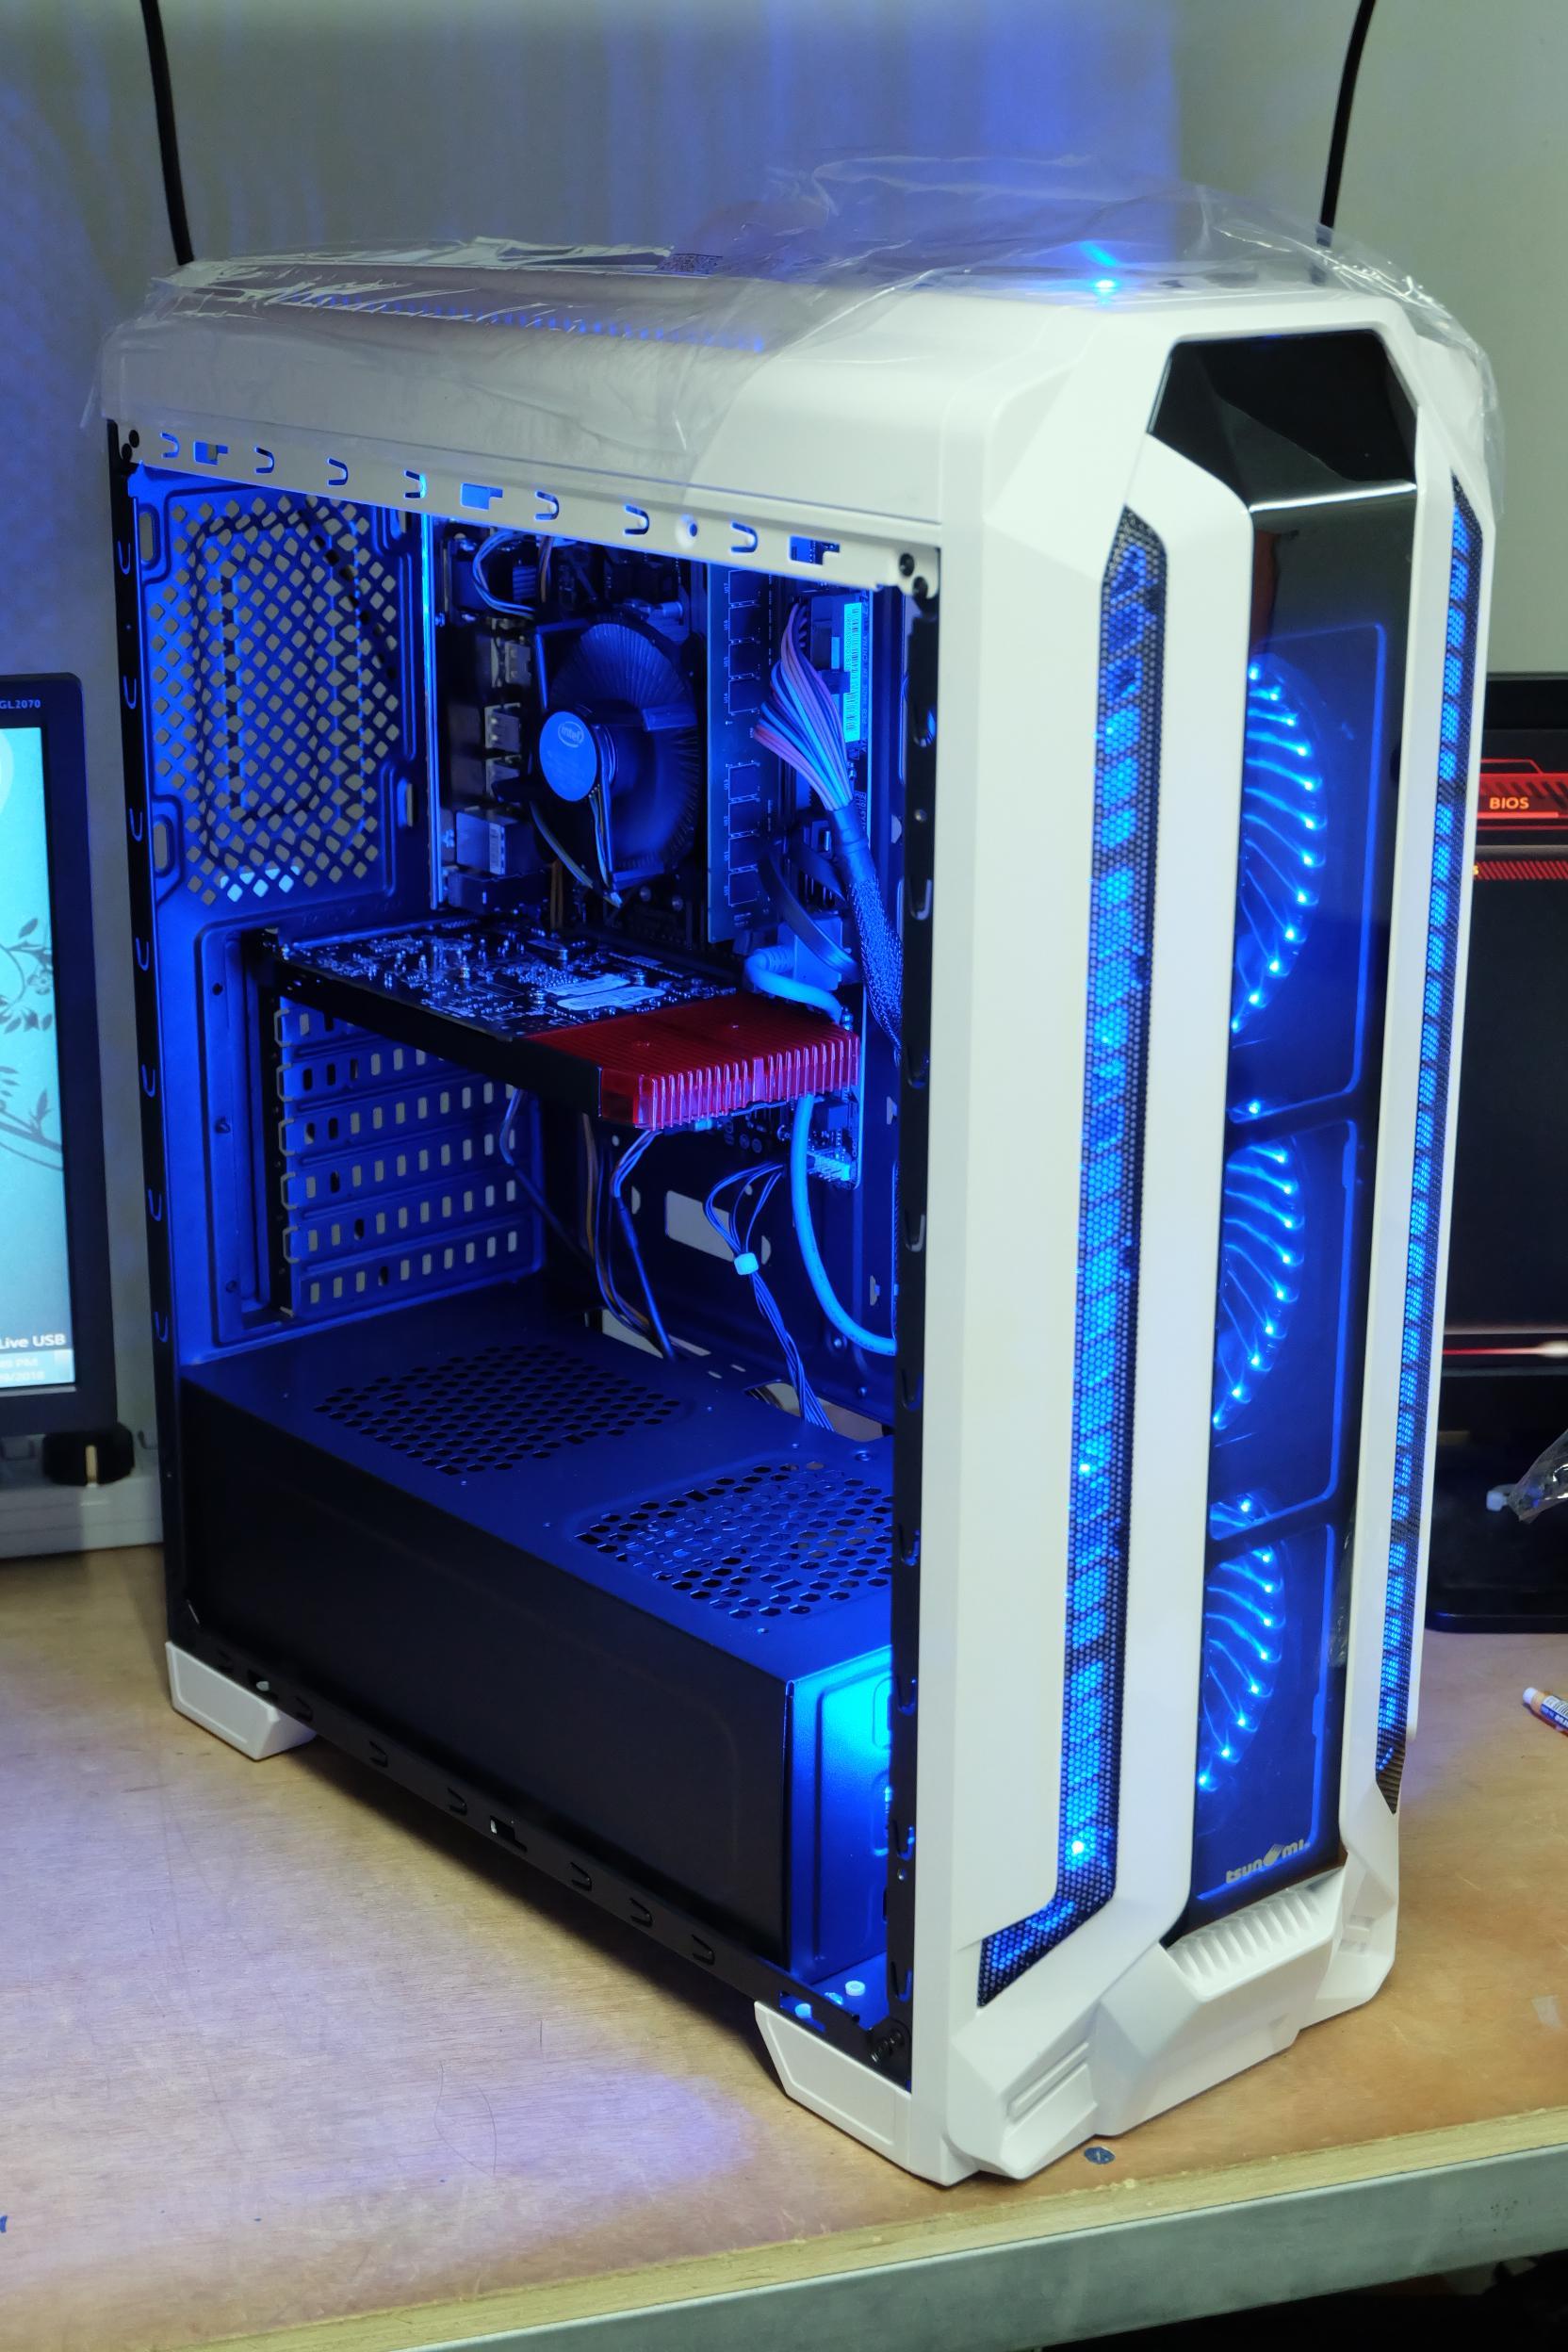 AMD FX 8300 Turbo 4.1Ghz 8 Core / 8GB / GTX 1050 Ti 4GB/ 120GB/1TB / 600W FULL / CASE HERO K2